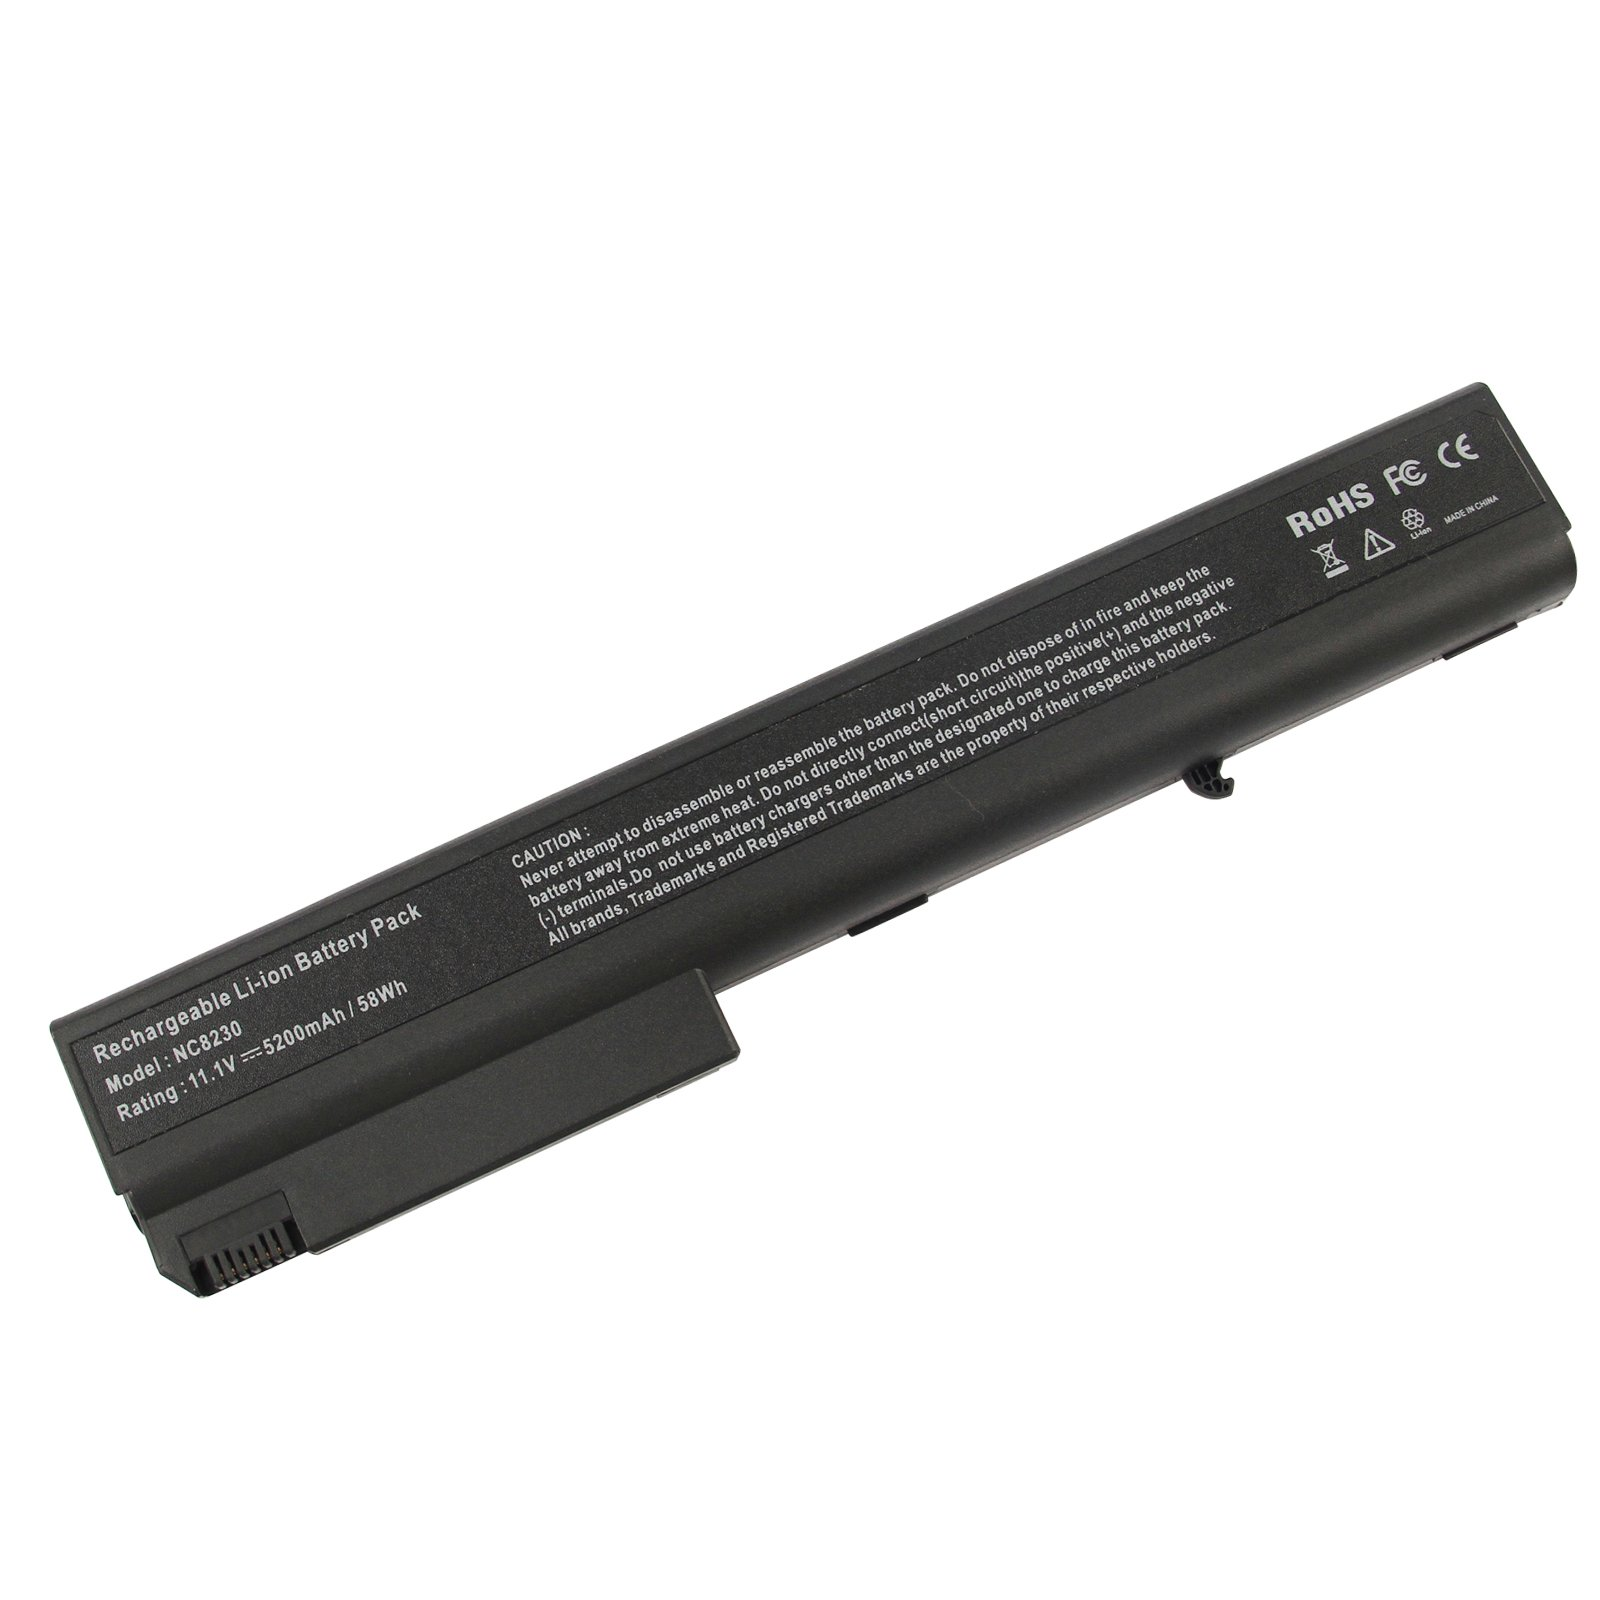 IDC CBL Pack of 10 HHPK24H//AE24G//X H1KXH-2436G